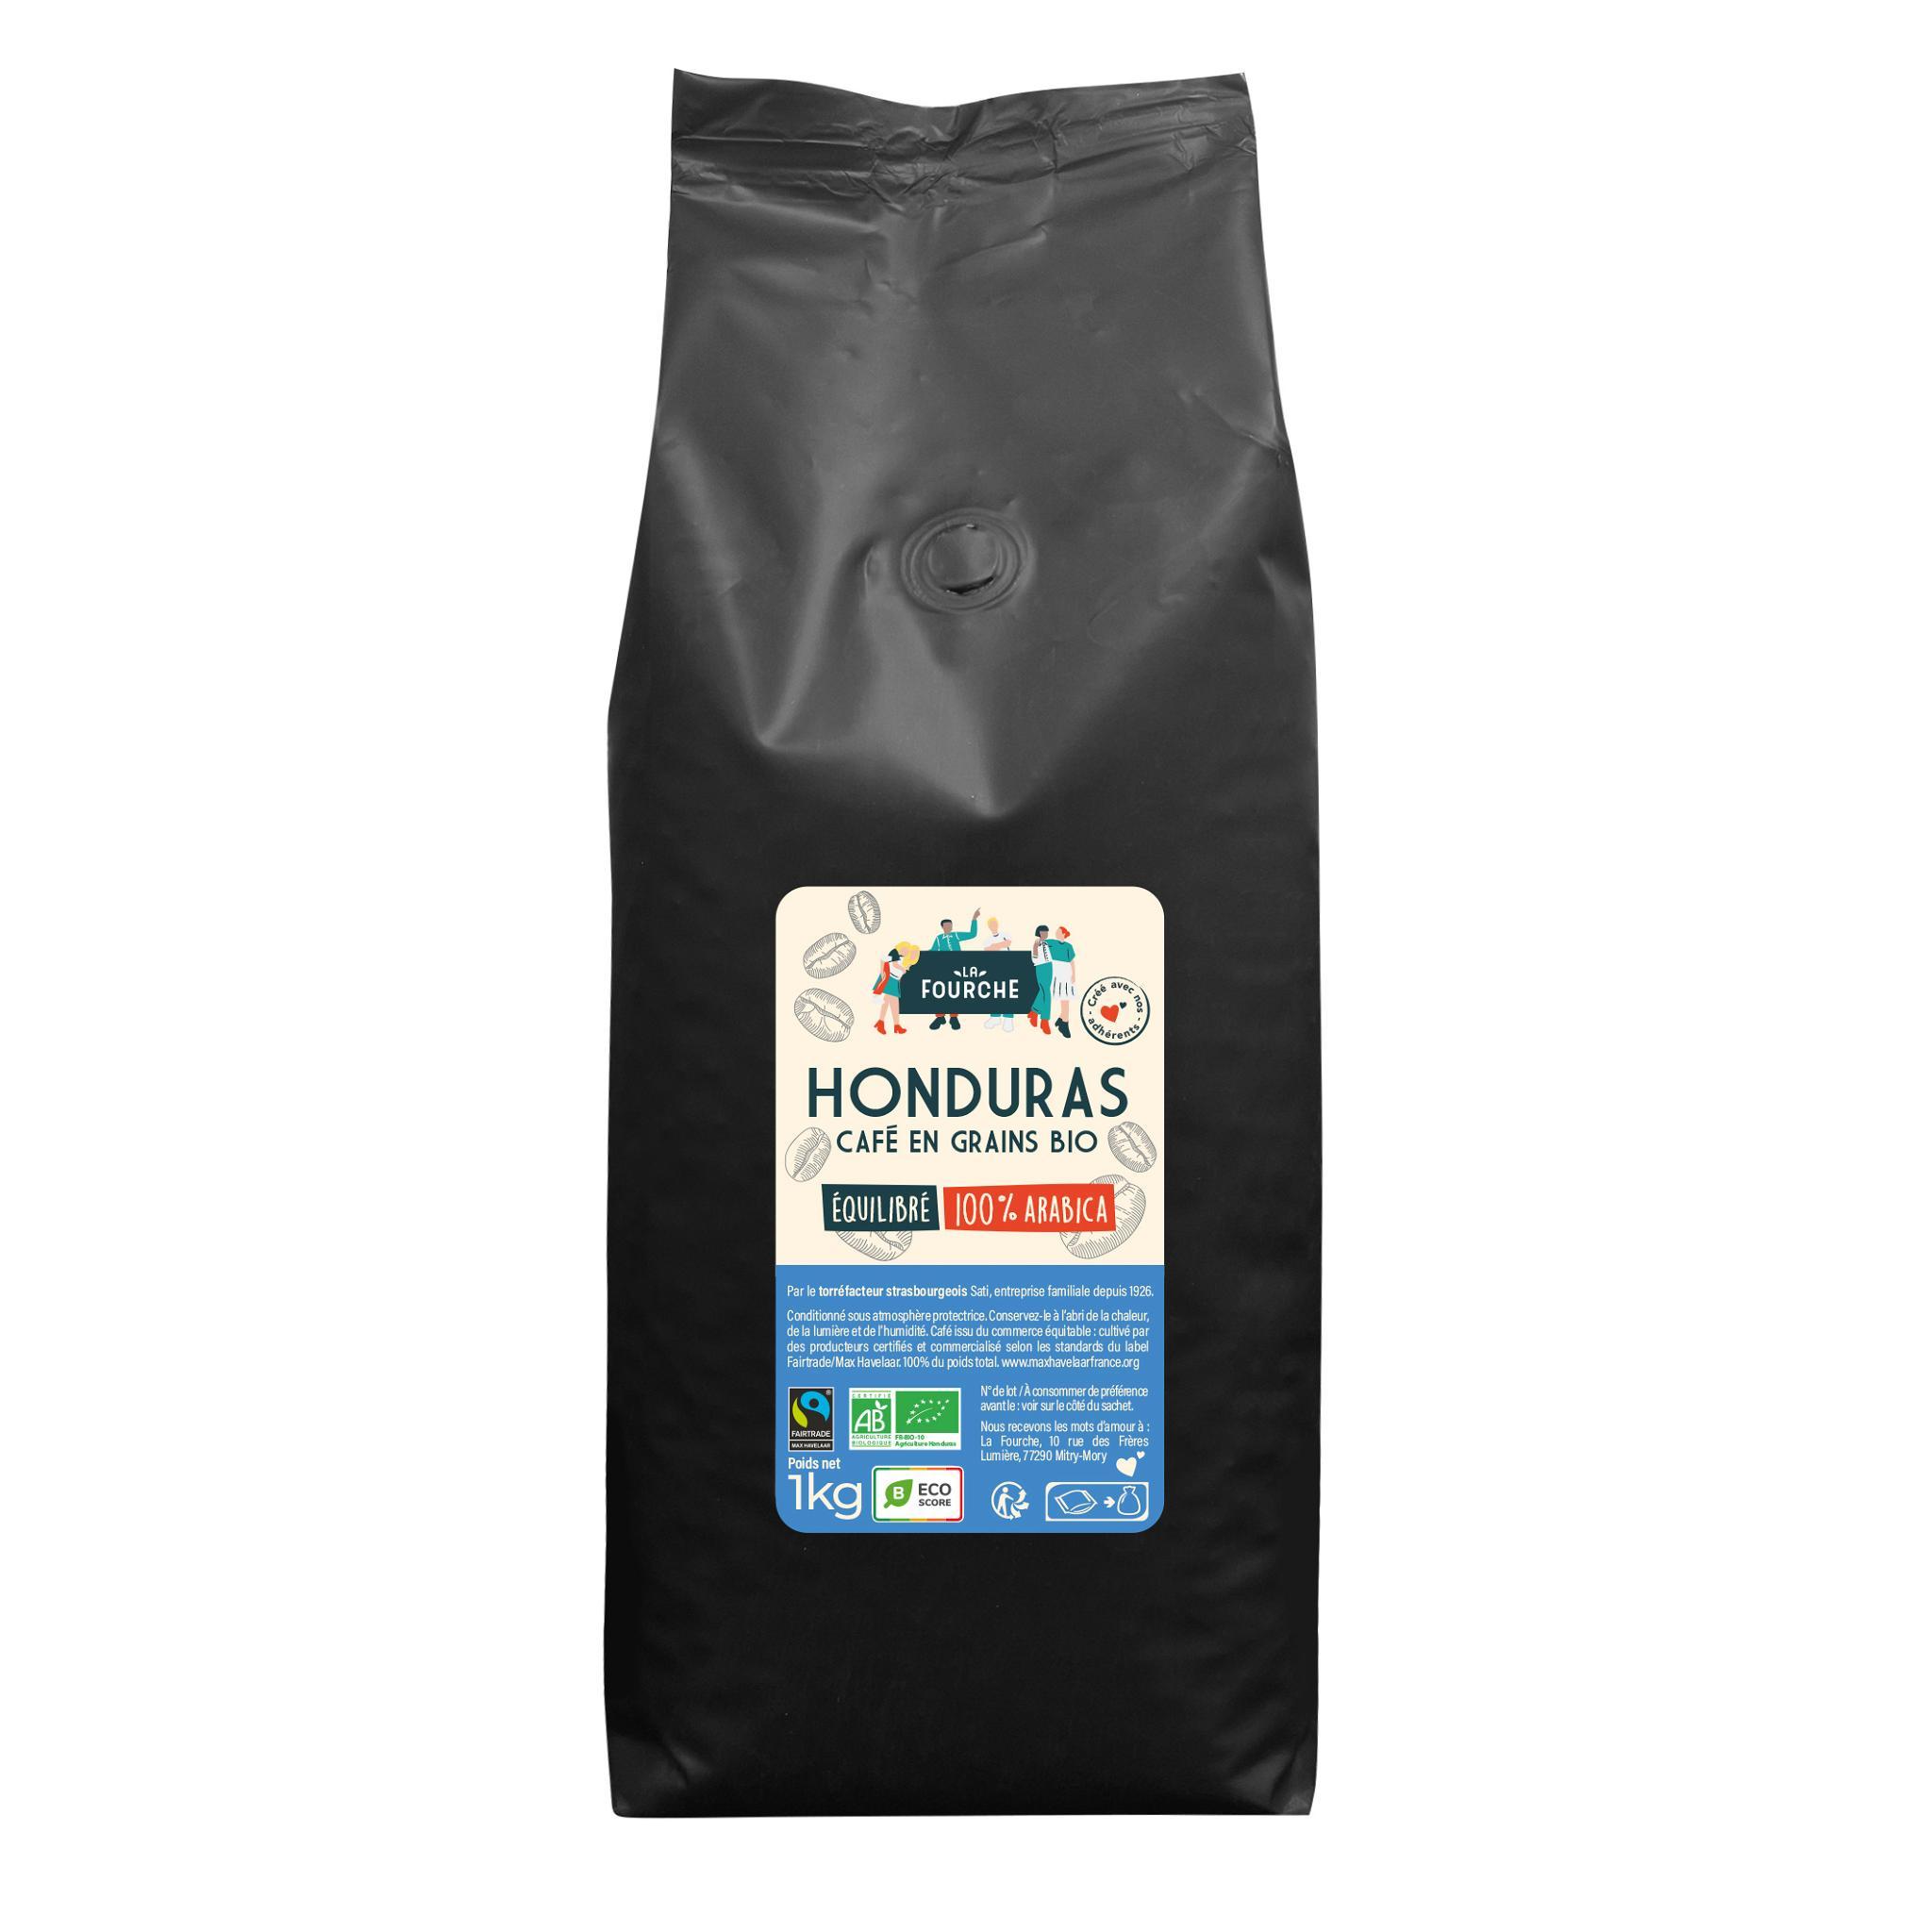 img-la-fourche-cafe-en-grains-equilibre-arabica-honduras-bio-equitable-1kg